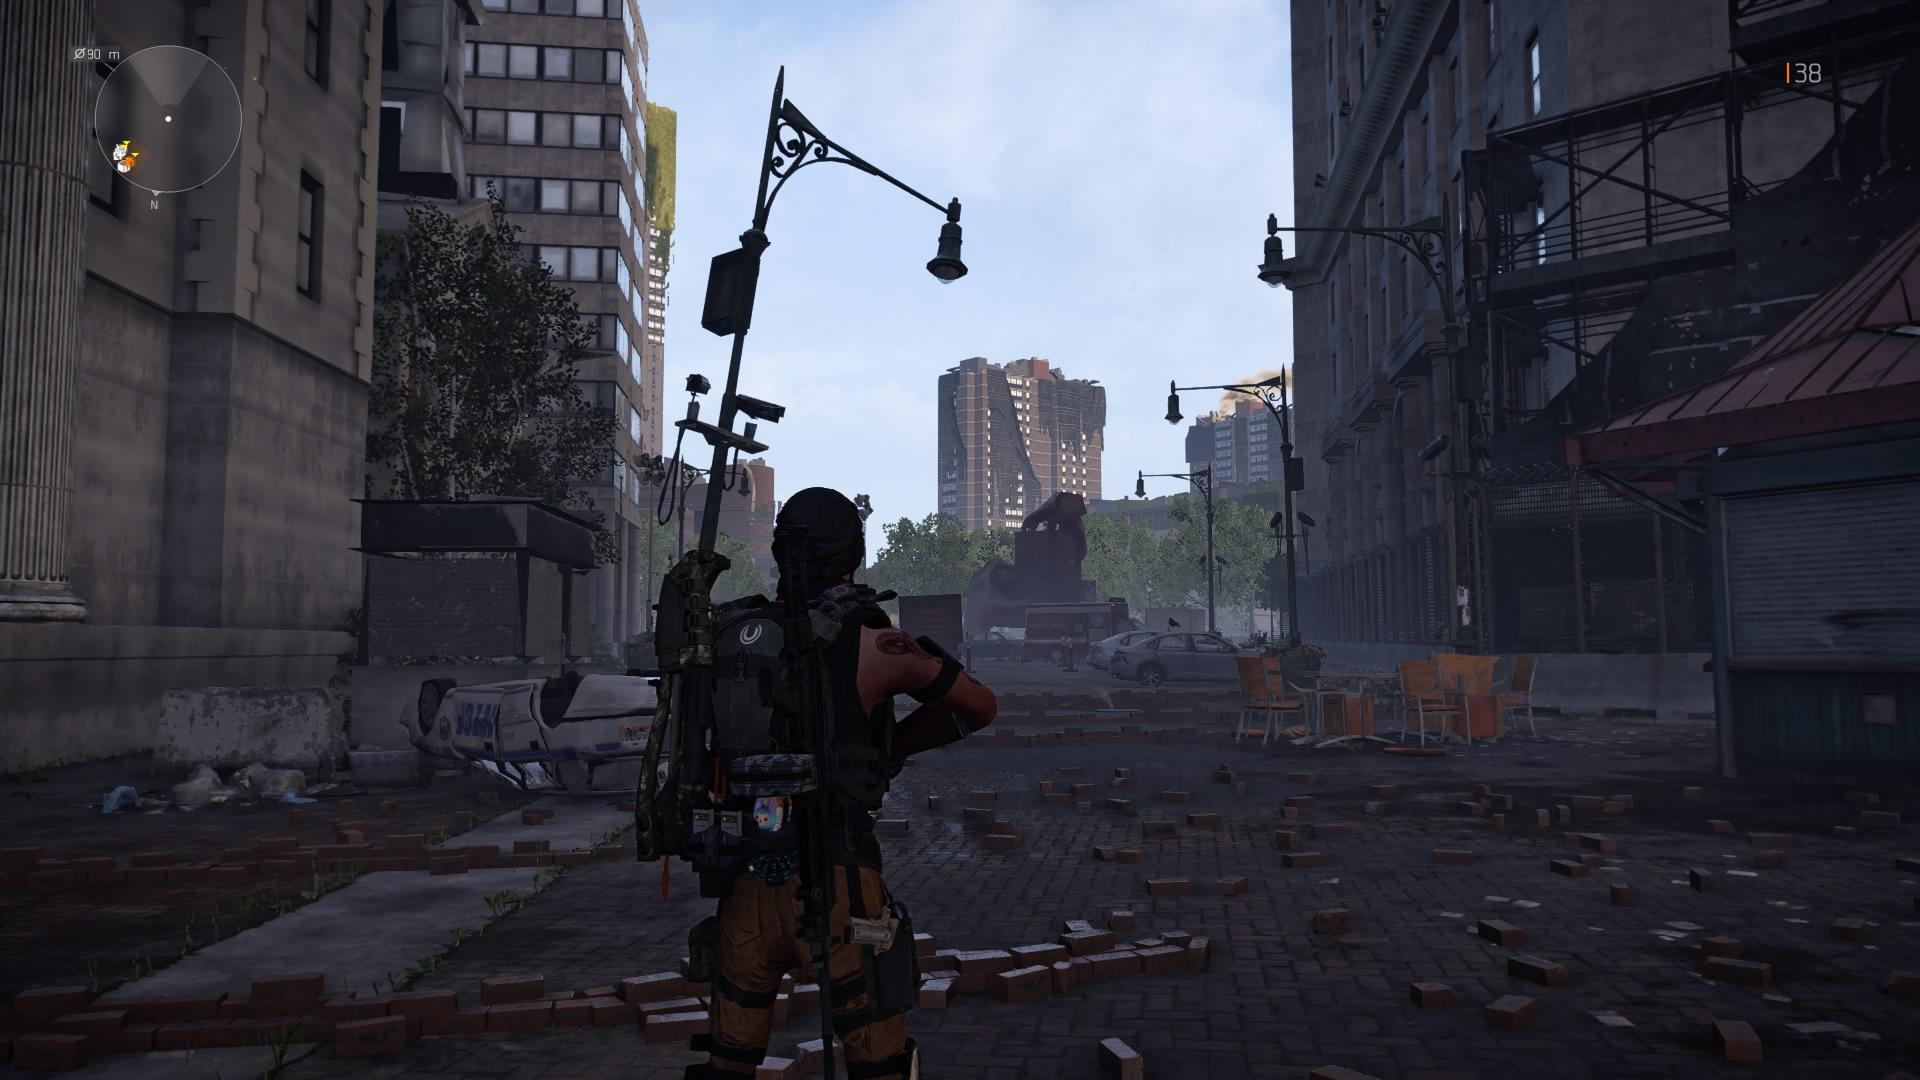 New York has Fallen! Again?